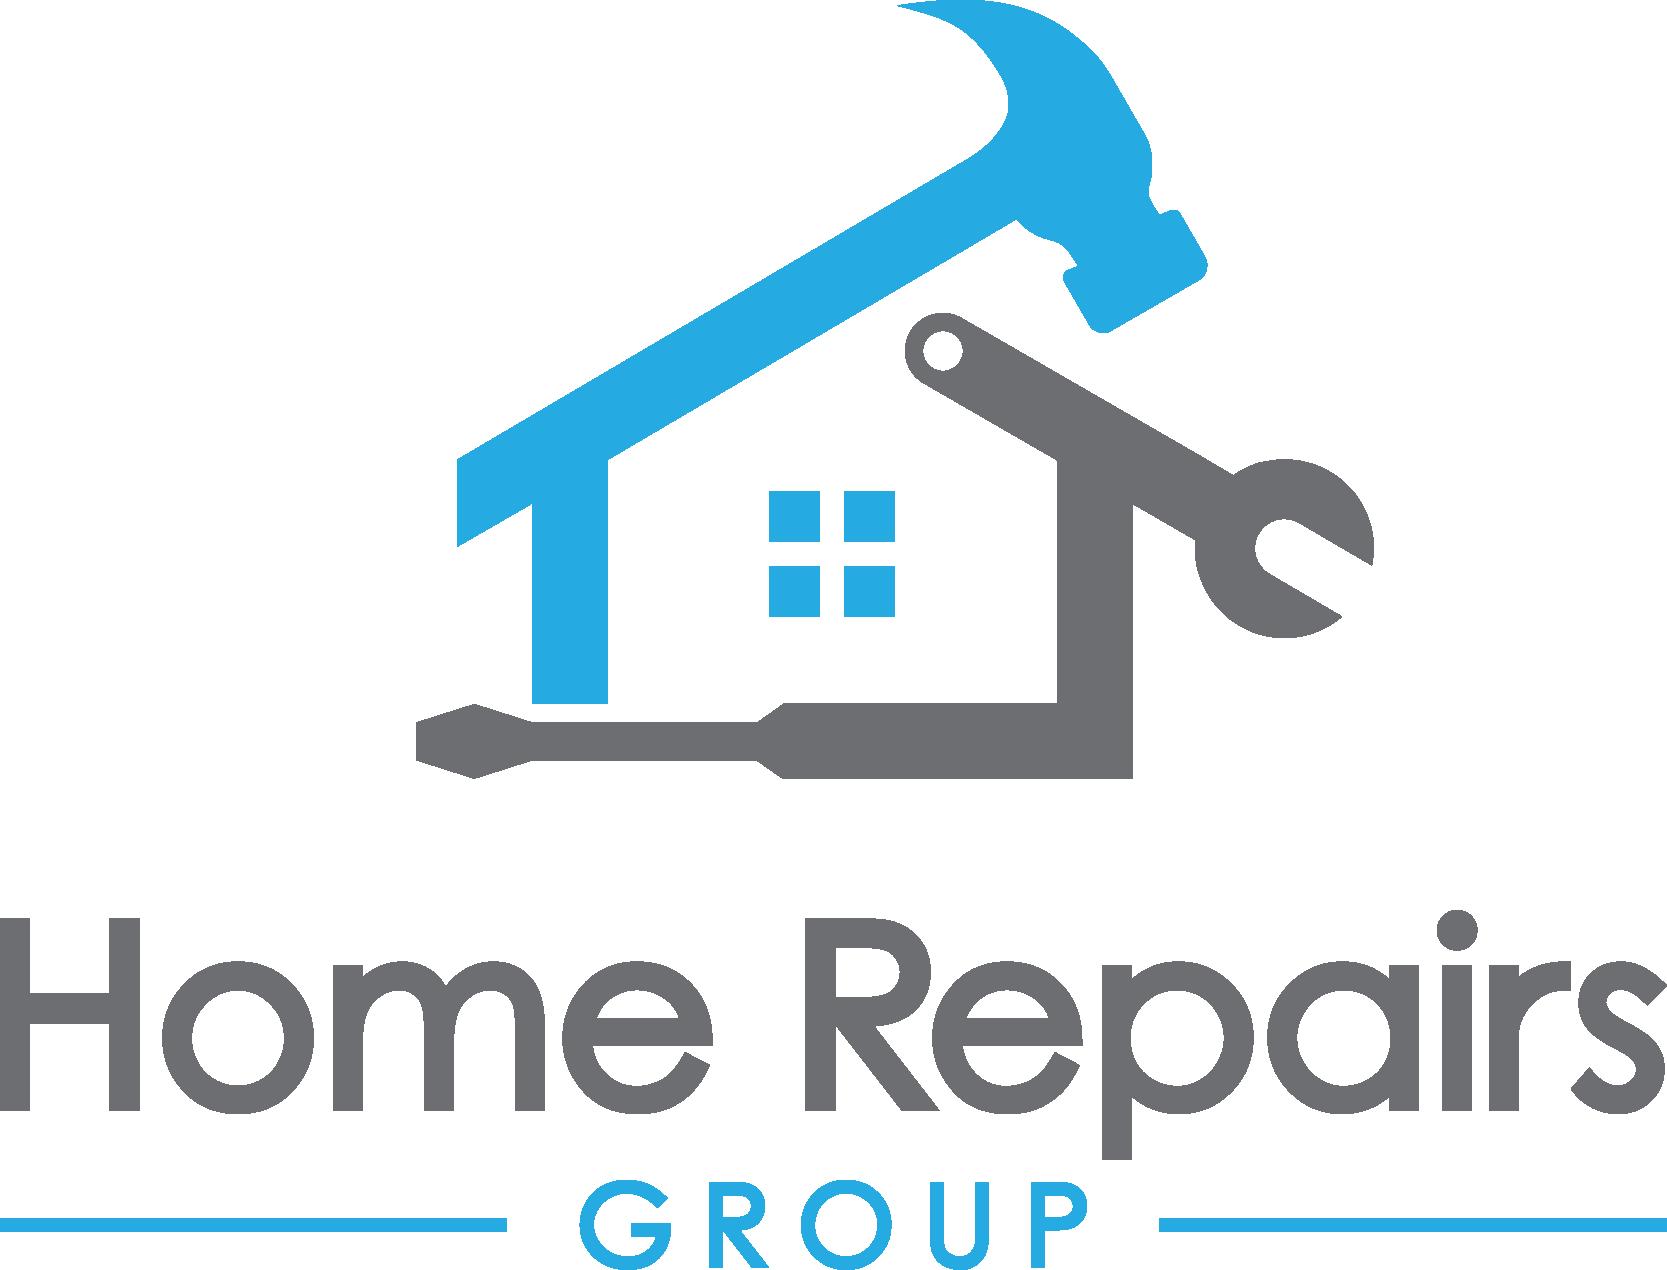 Home Repairs Group Logo